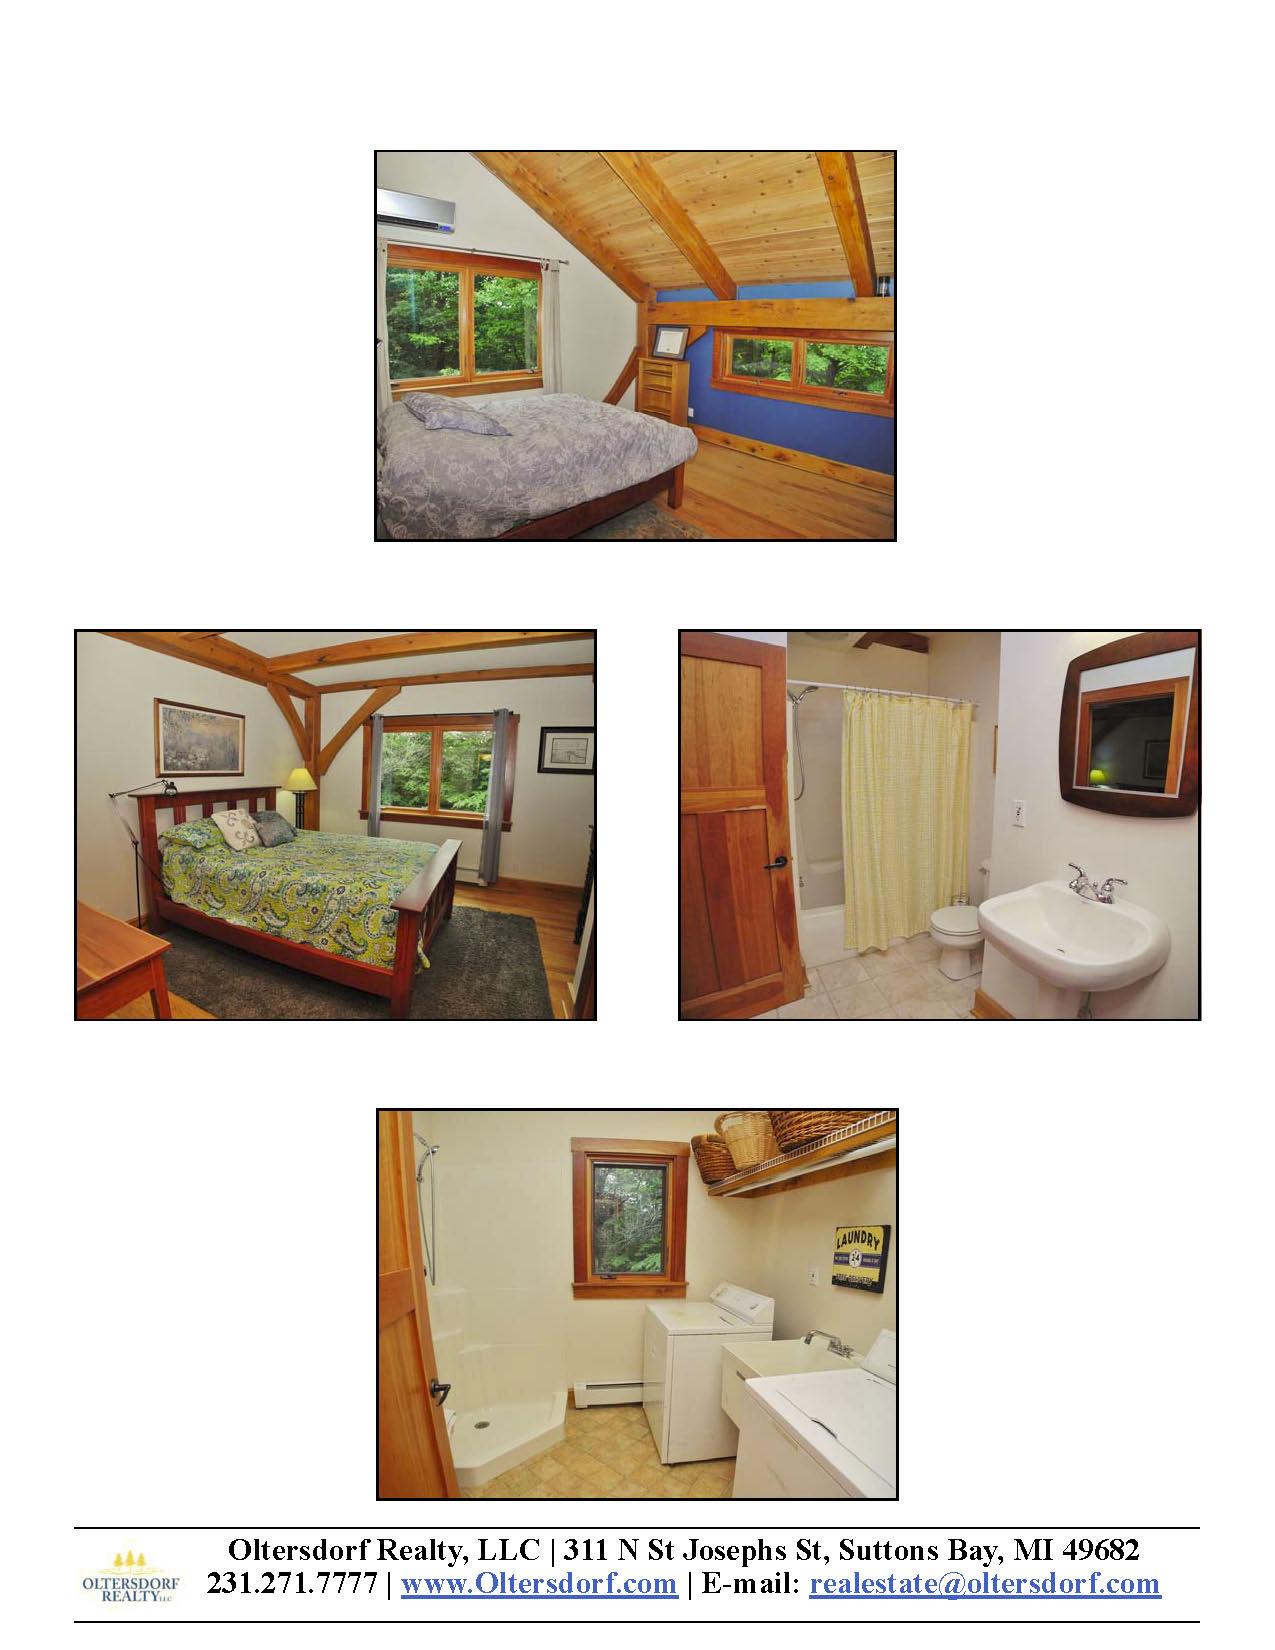 5500 E Hidden Beech, Cedar, MI - For sale by Oltersdorf Realty LLC - Marketing Packet (8).jpg